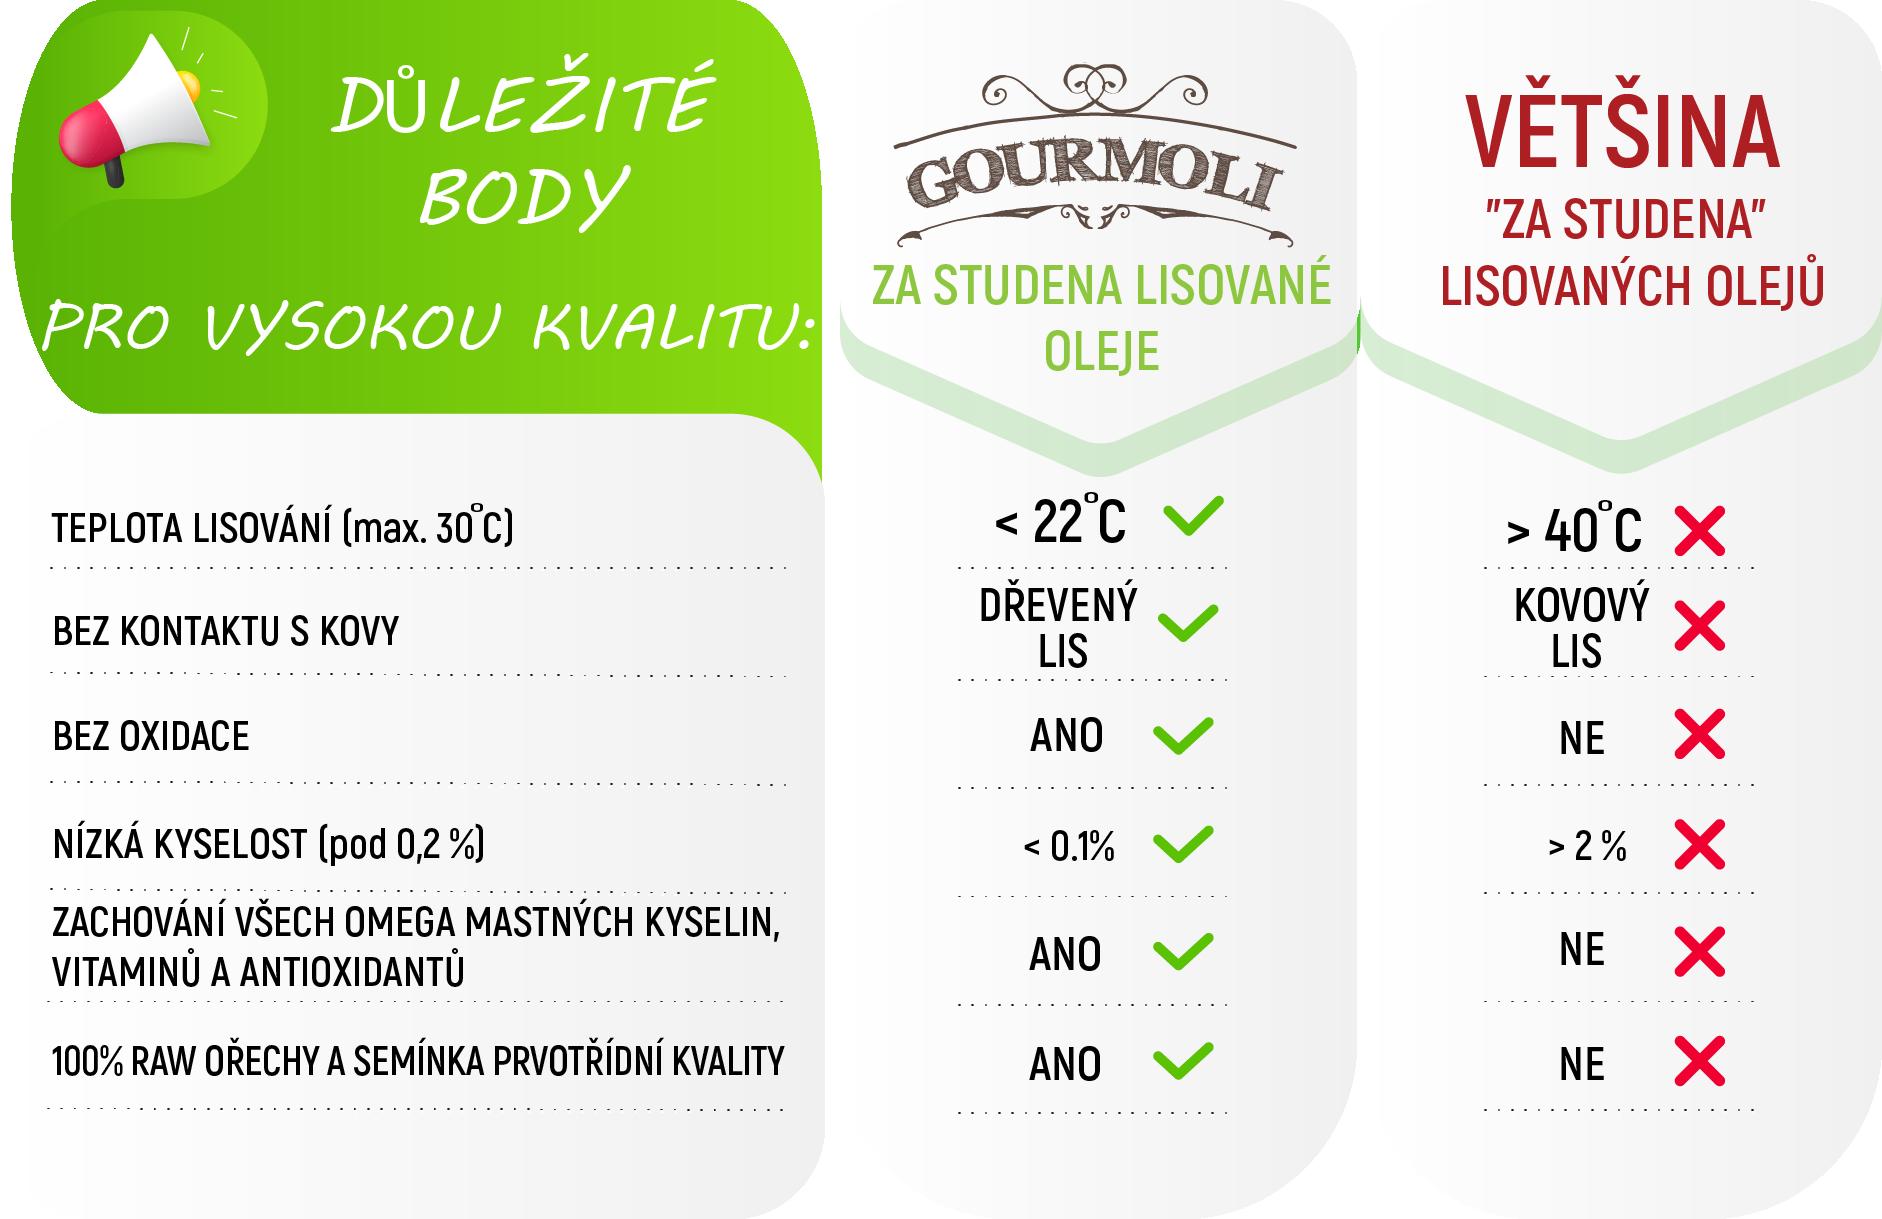 Benefits of Gourmoli CZ website